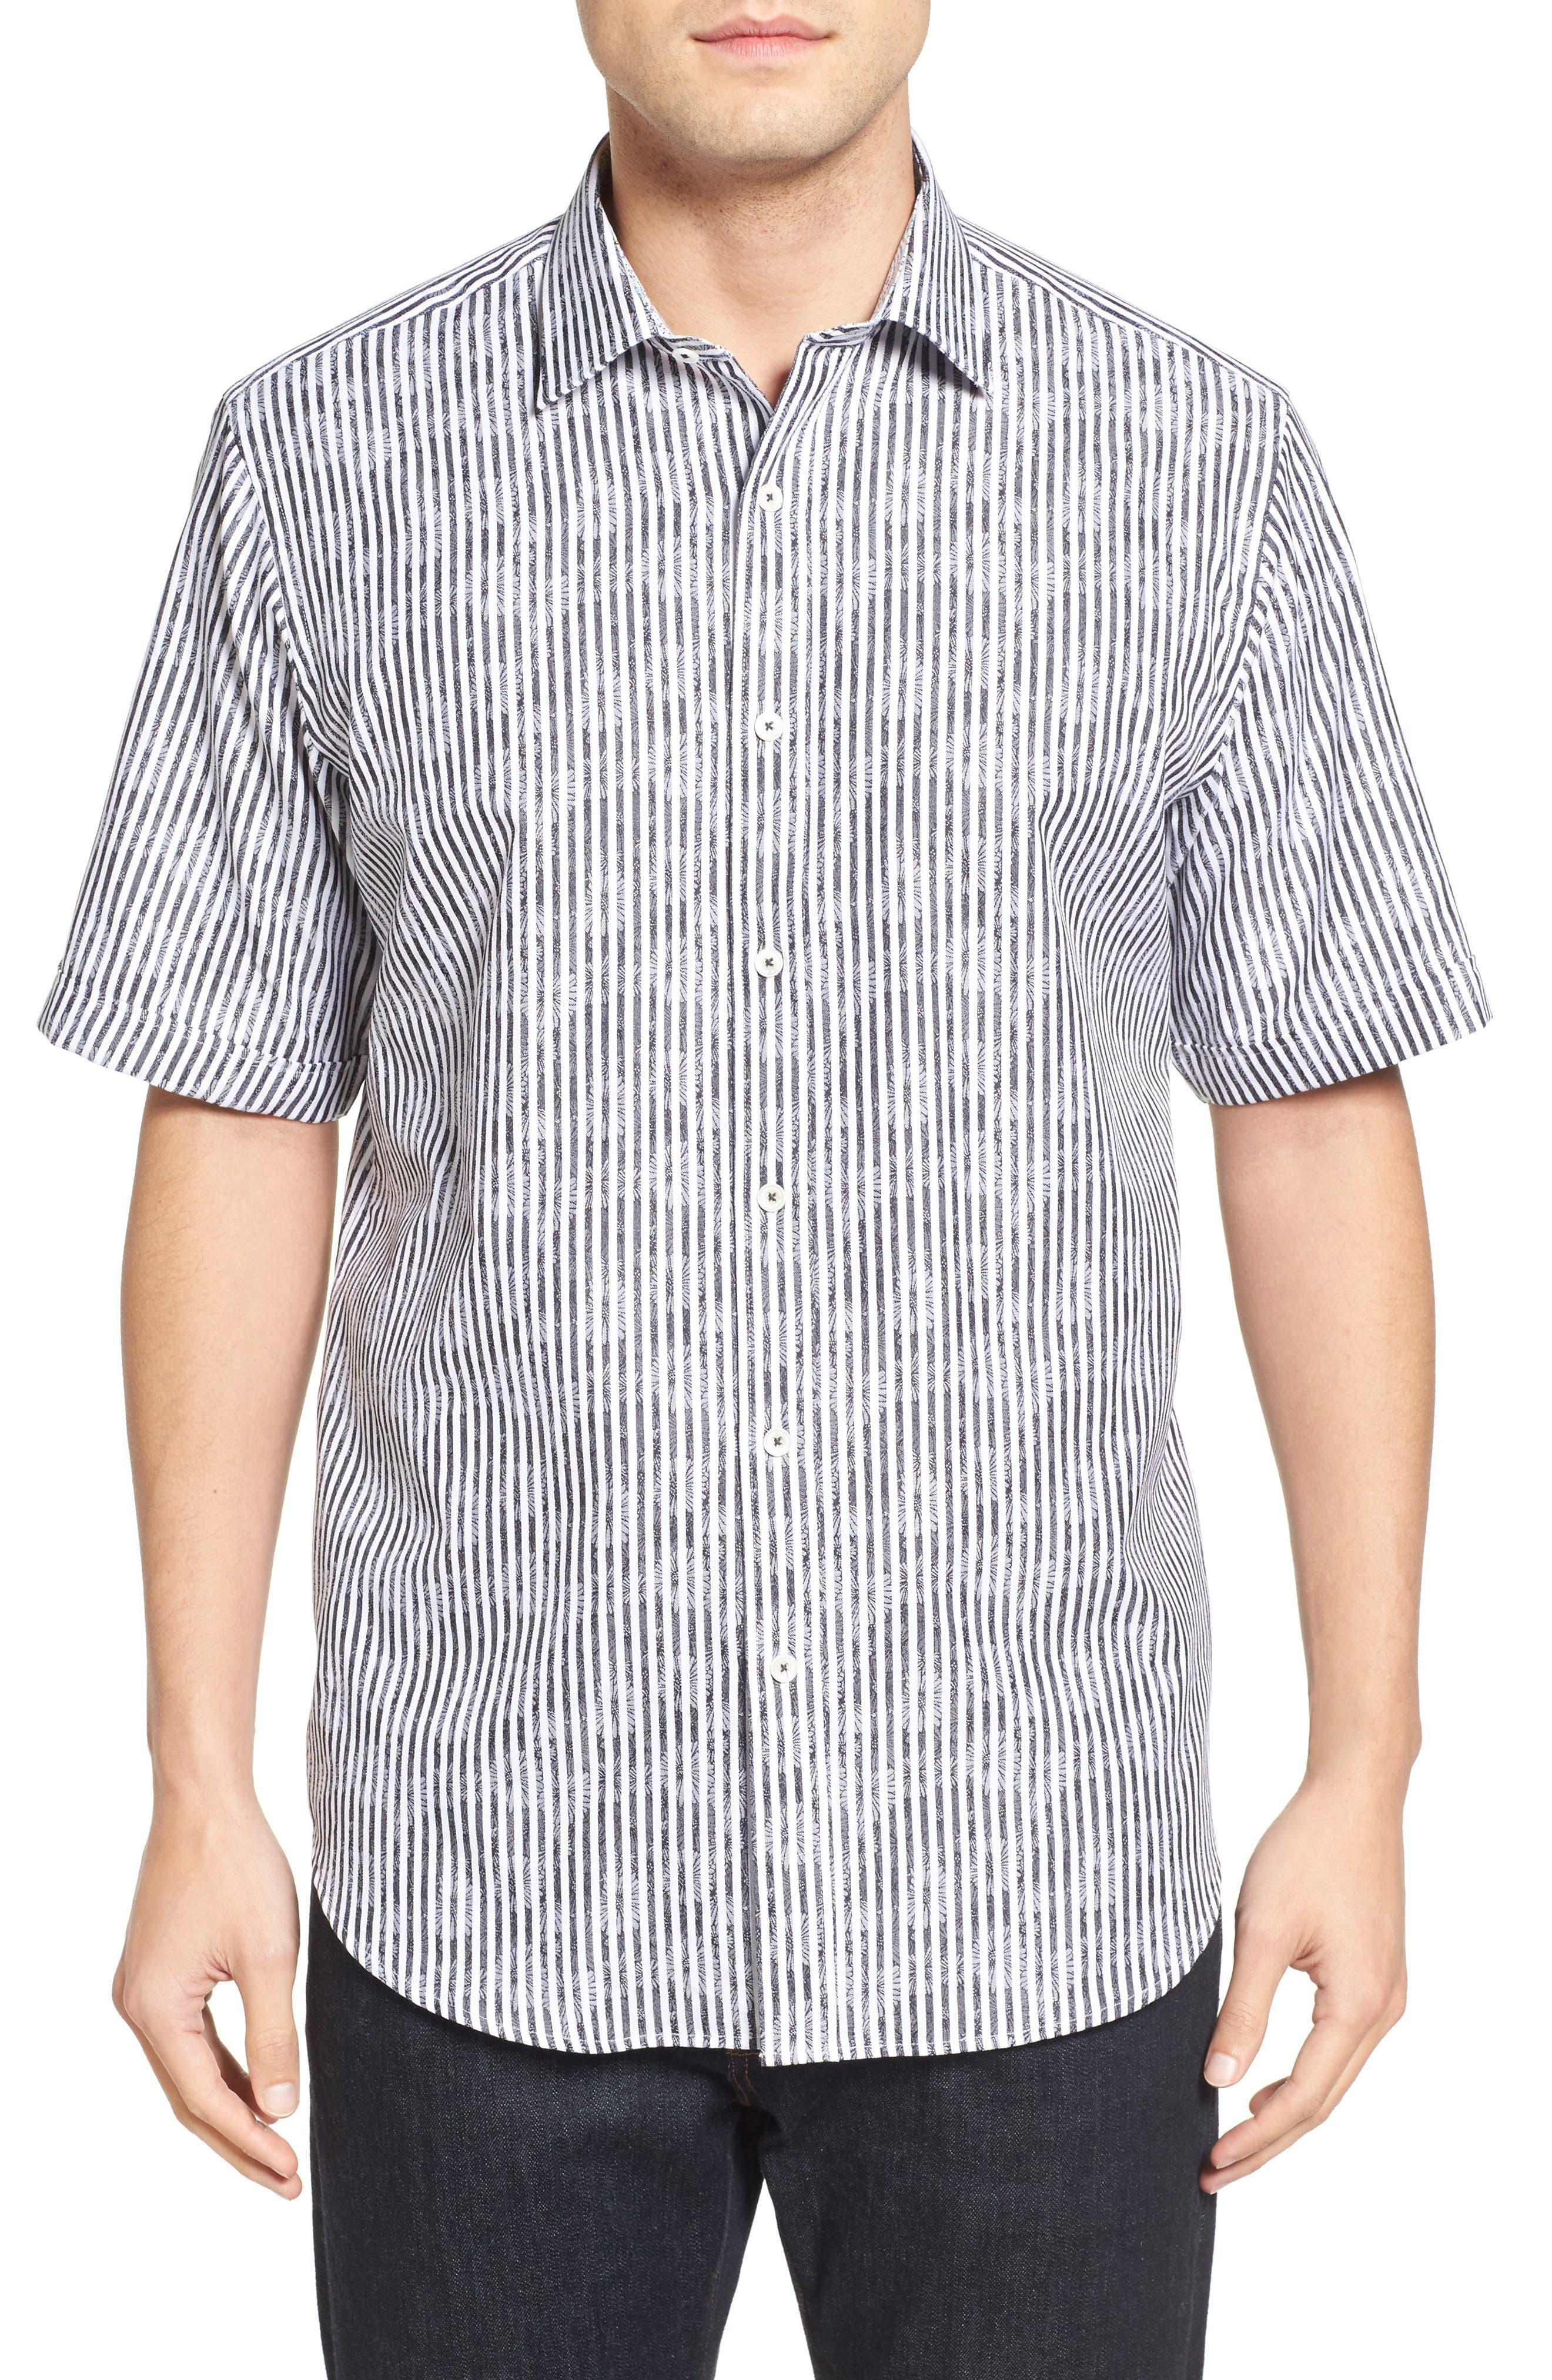 Main Image - Bugatchi Classic Fit Floral Stripe Sport Shirt